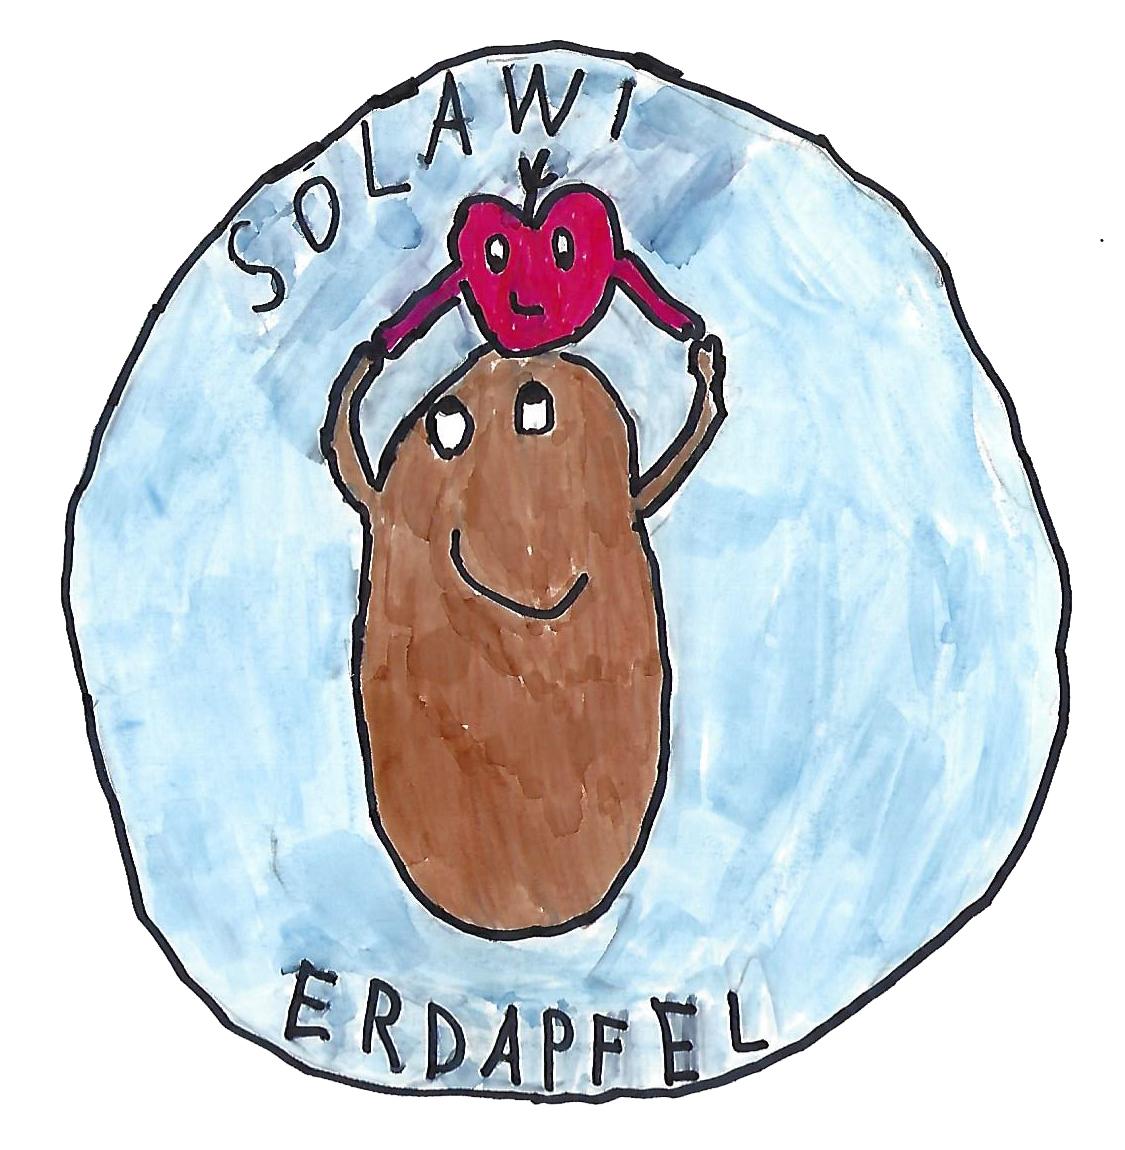 Unser SoLaWi-Logo